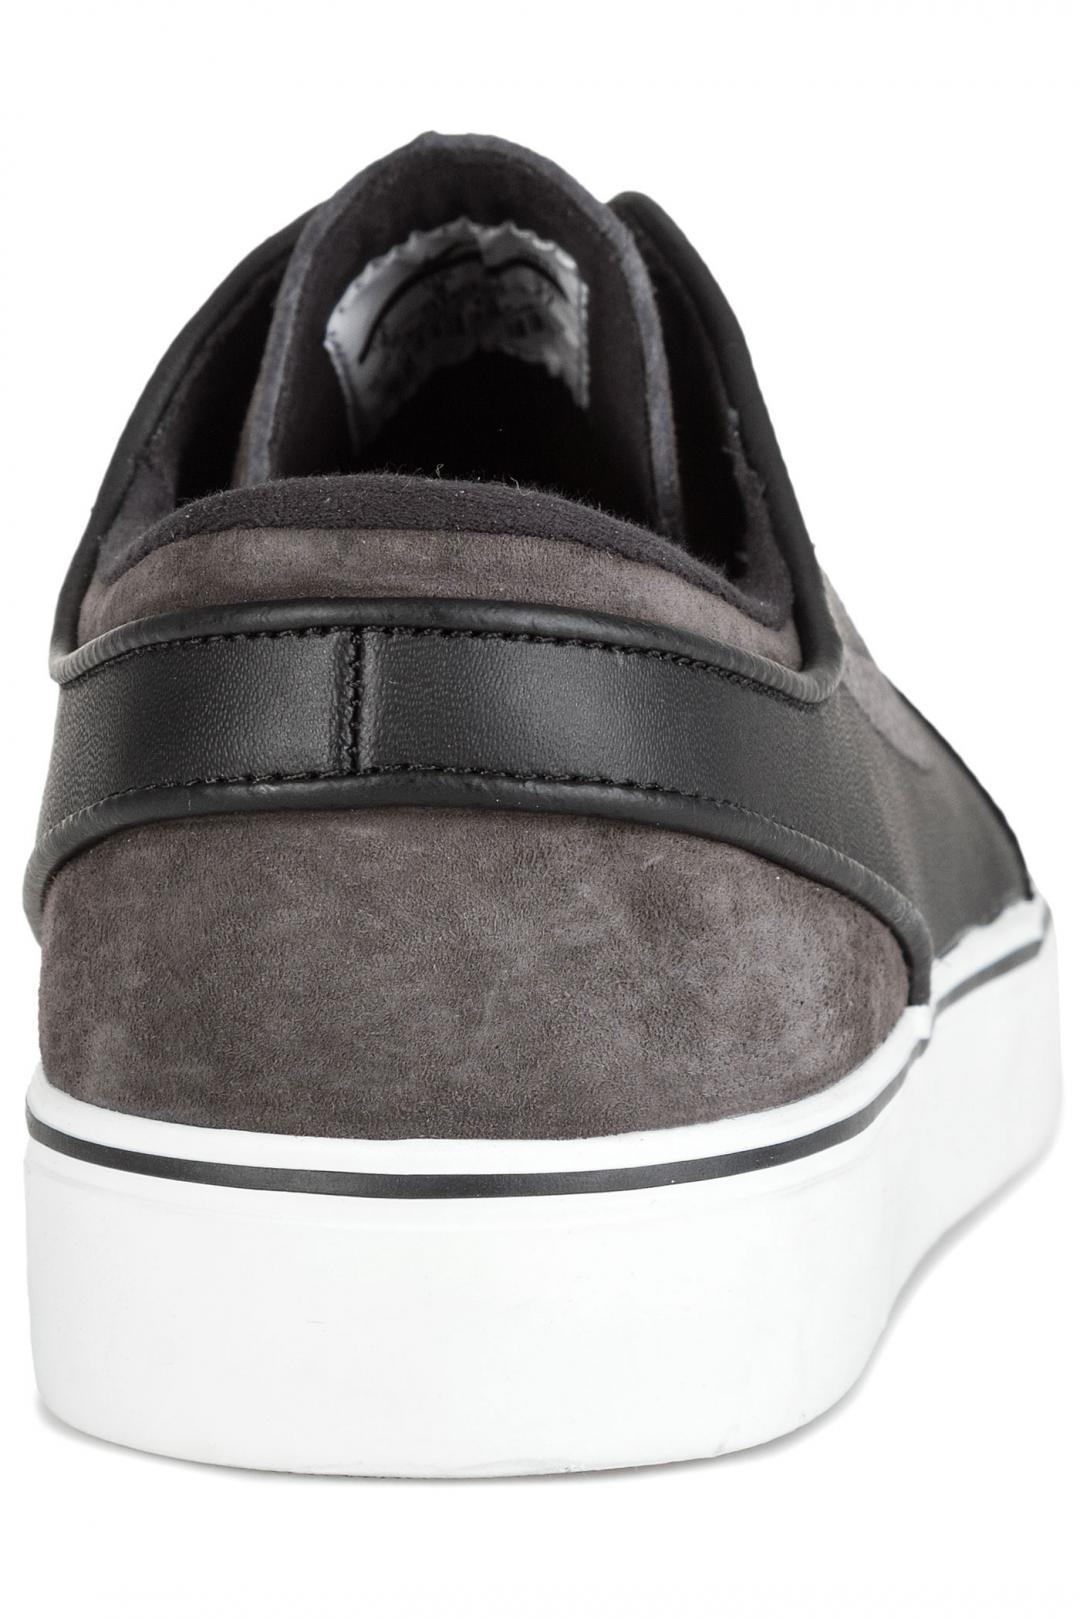 Uomo Nike SB Zoom Stefan Janoski OG midnight fog black | Sneakers low top